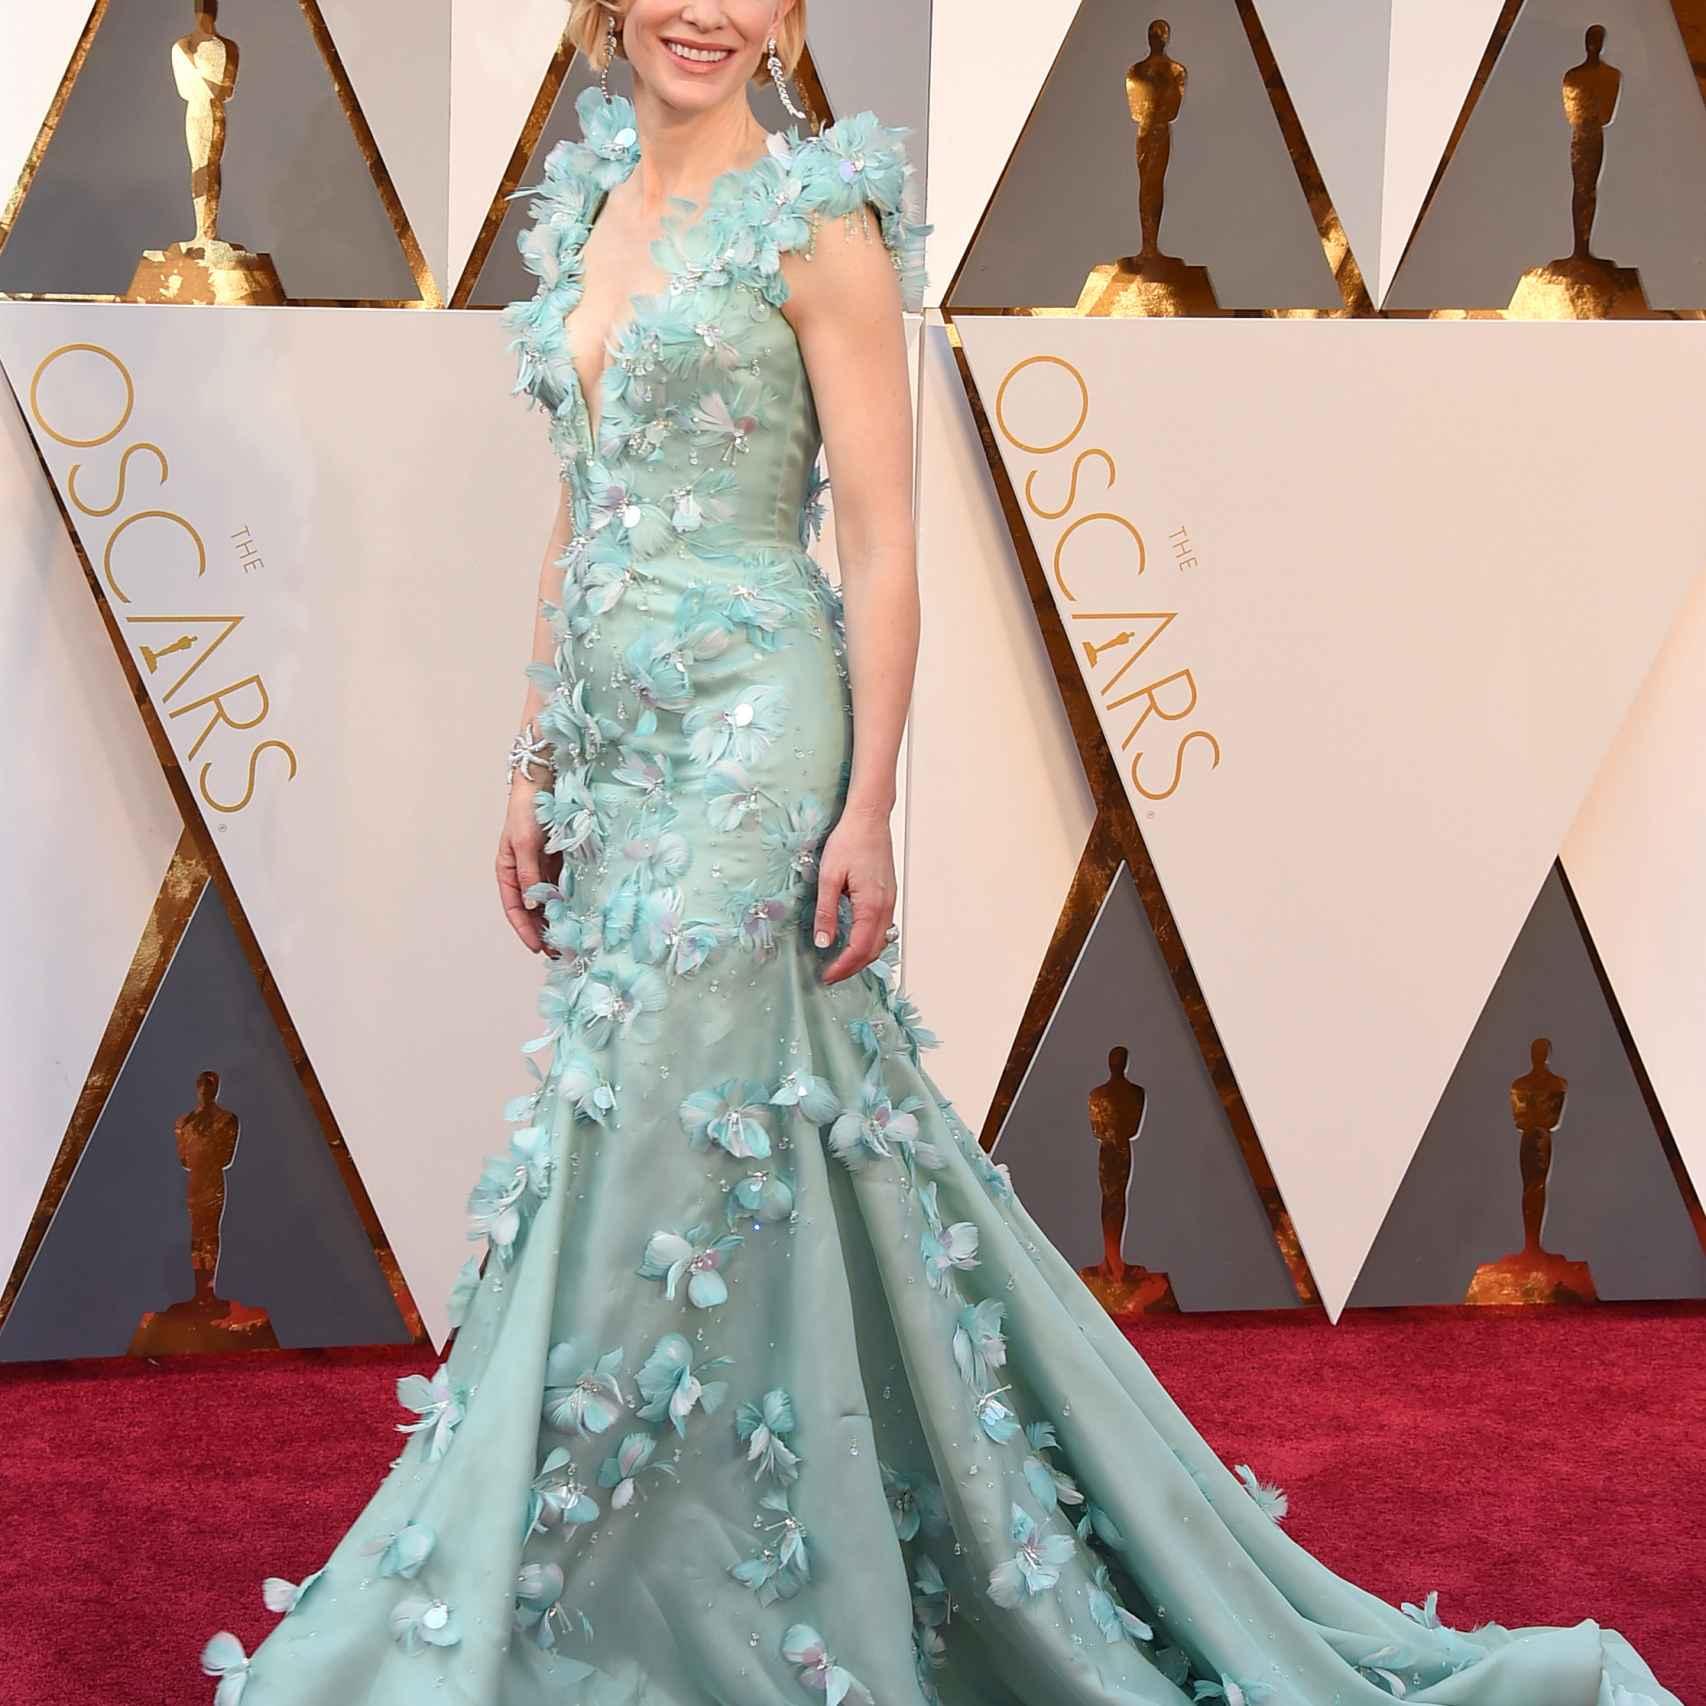 Cate Blanchett espectacular con un vestido floral de Armani